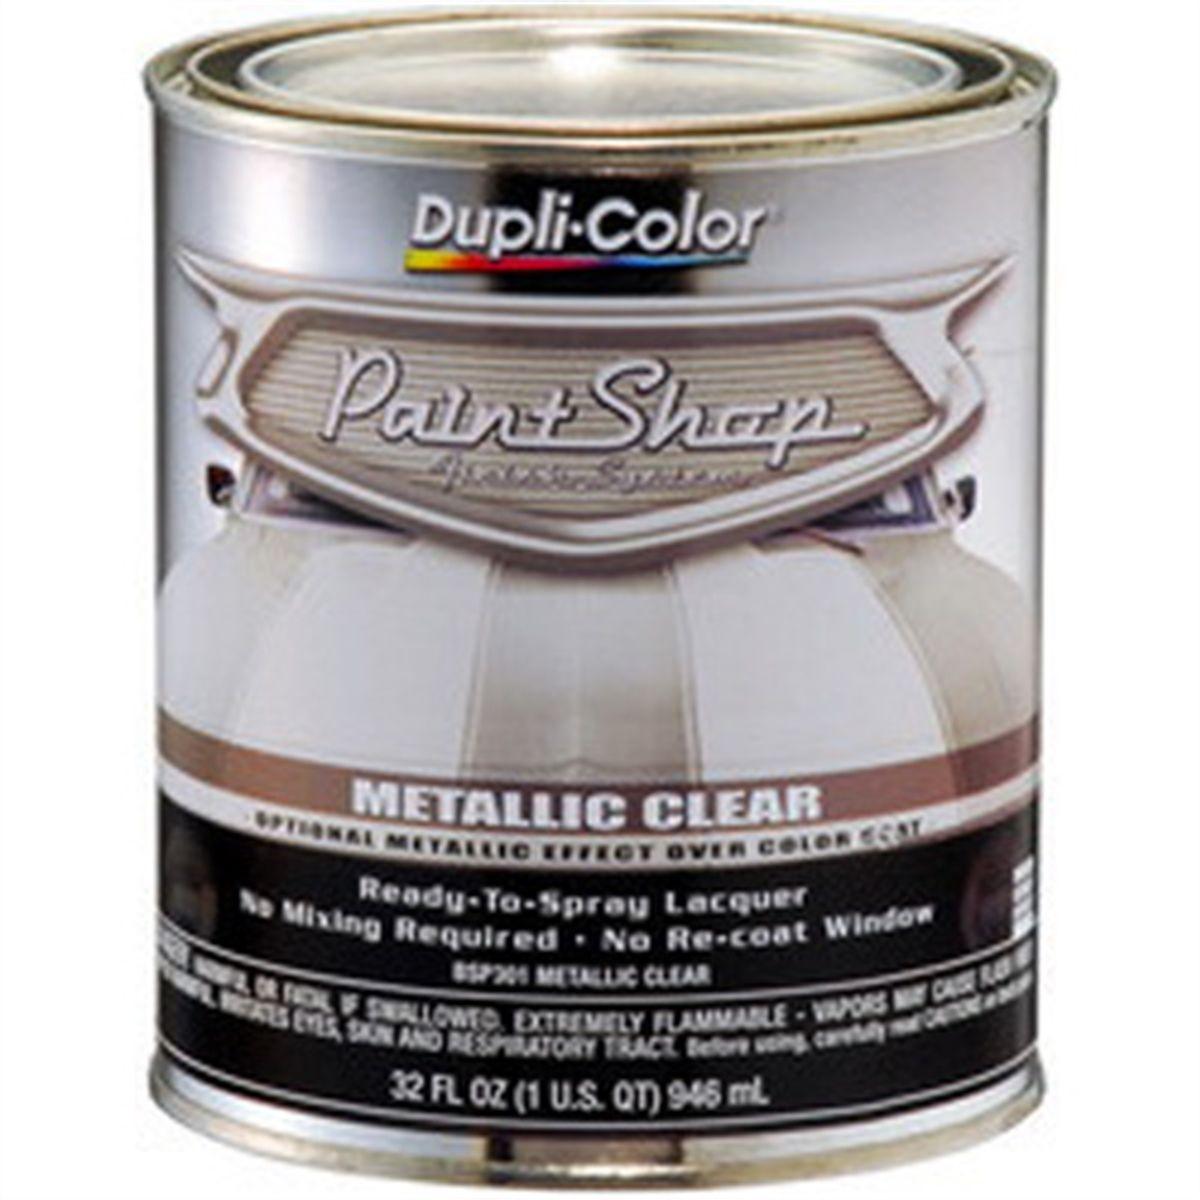 Paint Shop Metallic Clear BSP301